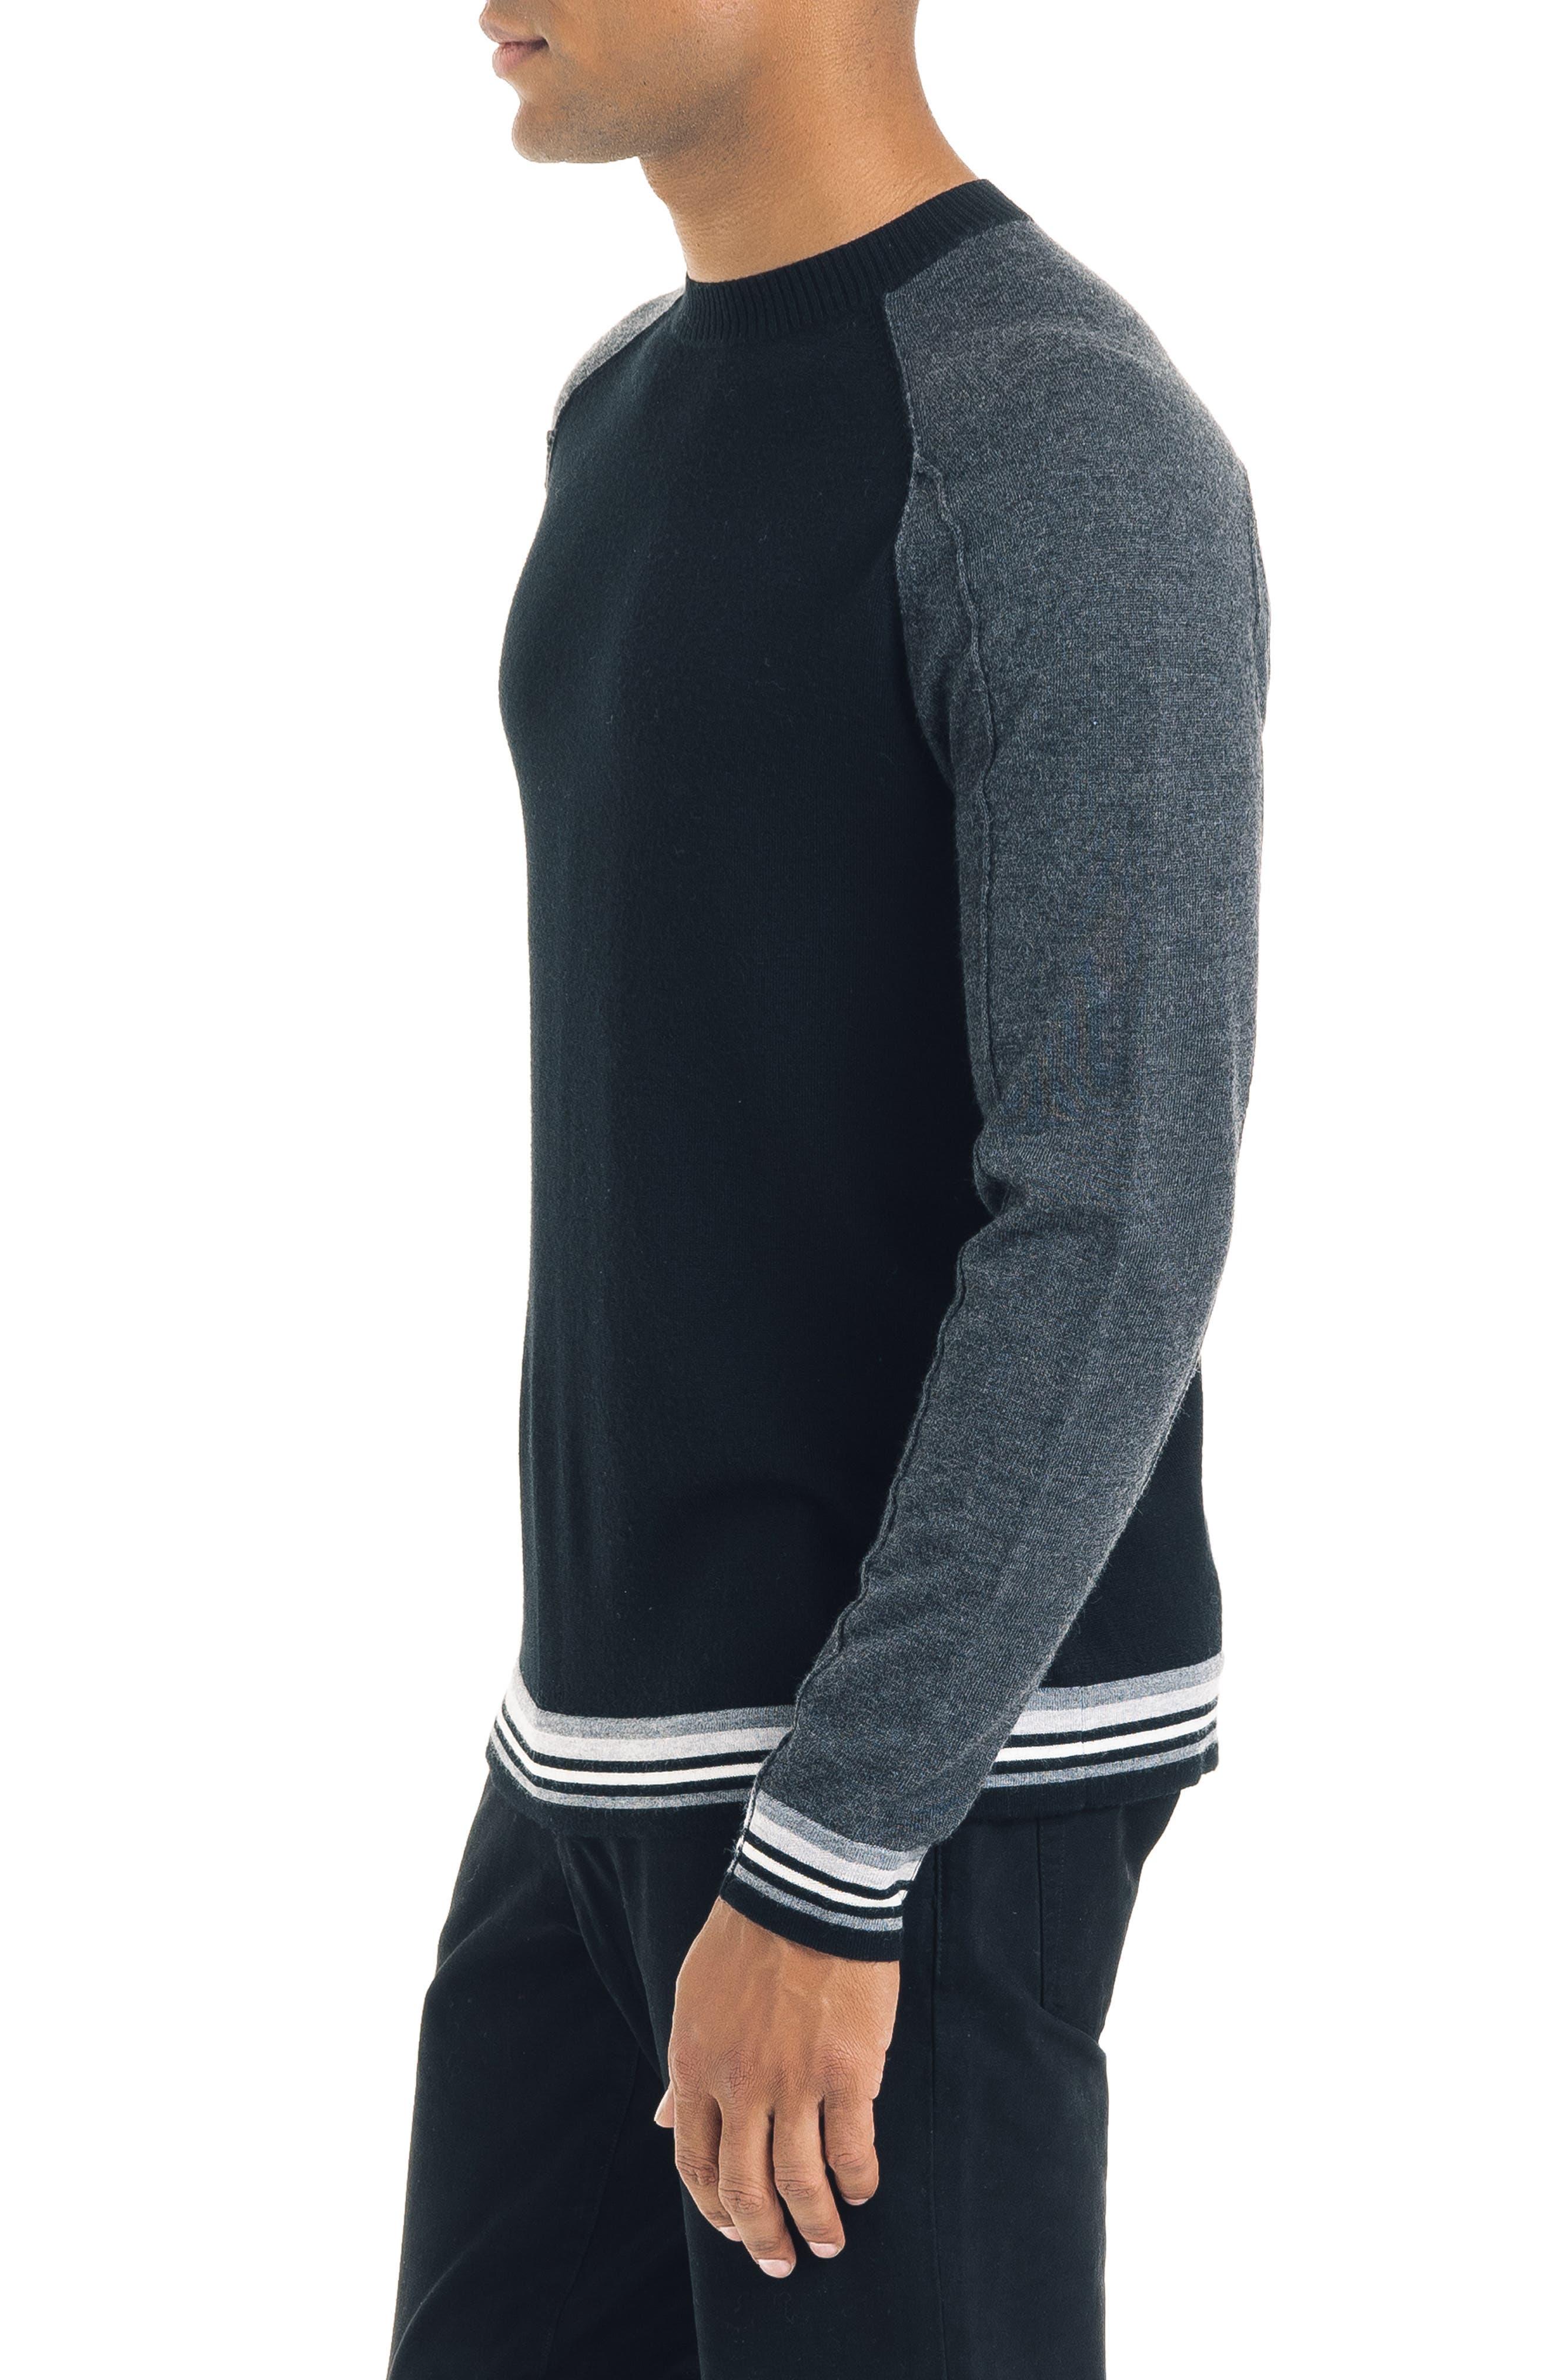 Mix Modern Slim Fit Wool Sweater,                             Alternate thumbnail 3, color,                             BLACK